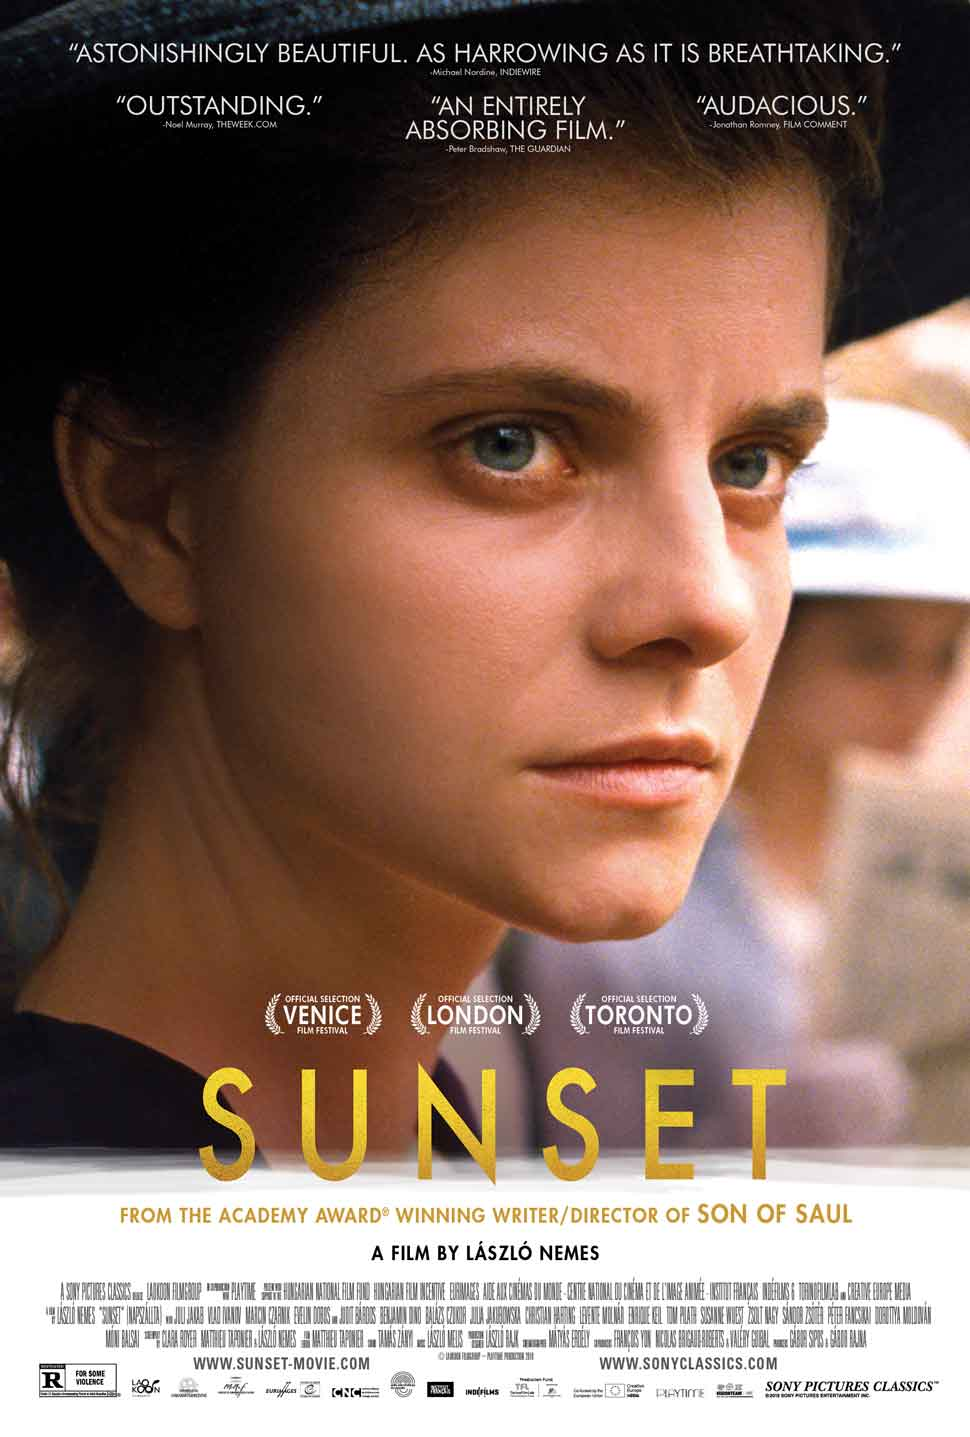 Sunset international poster art